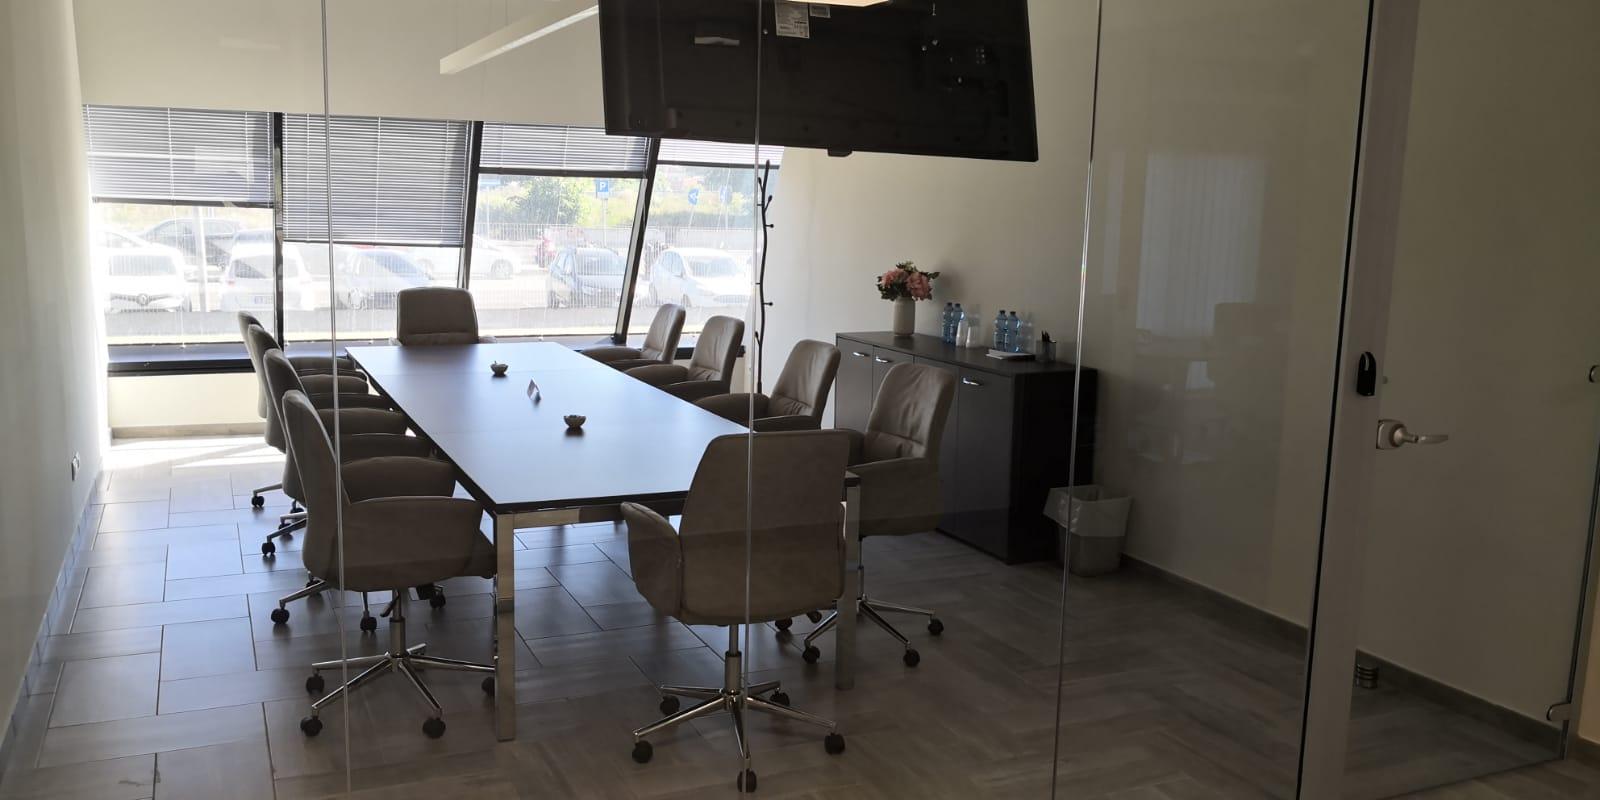 Arredamento_e_ristrutturazione_aziendale_GruppoPscSpa_GruppoSmau (12)